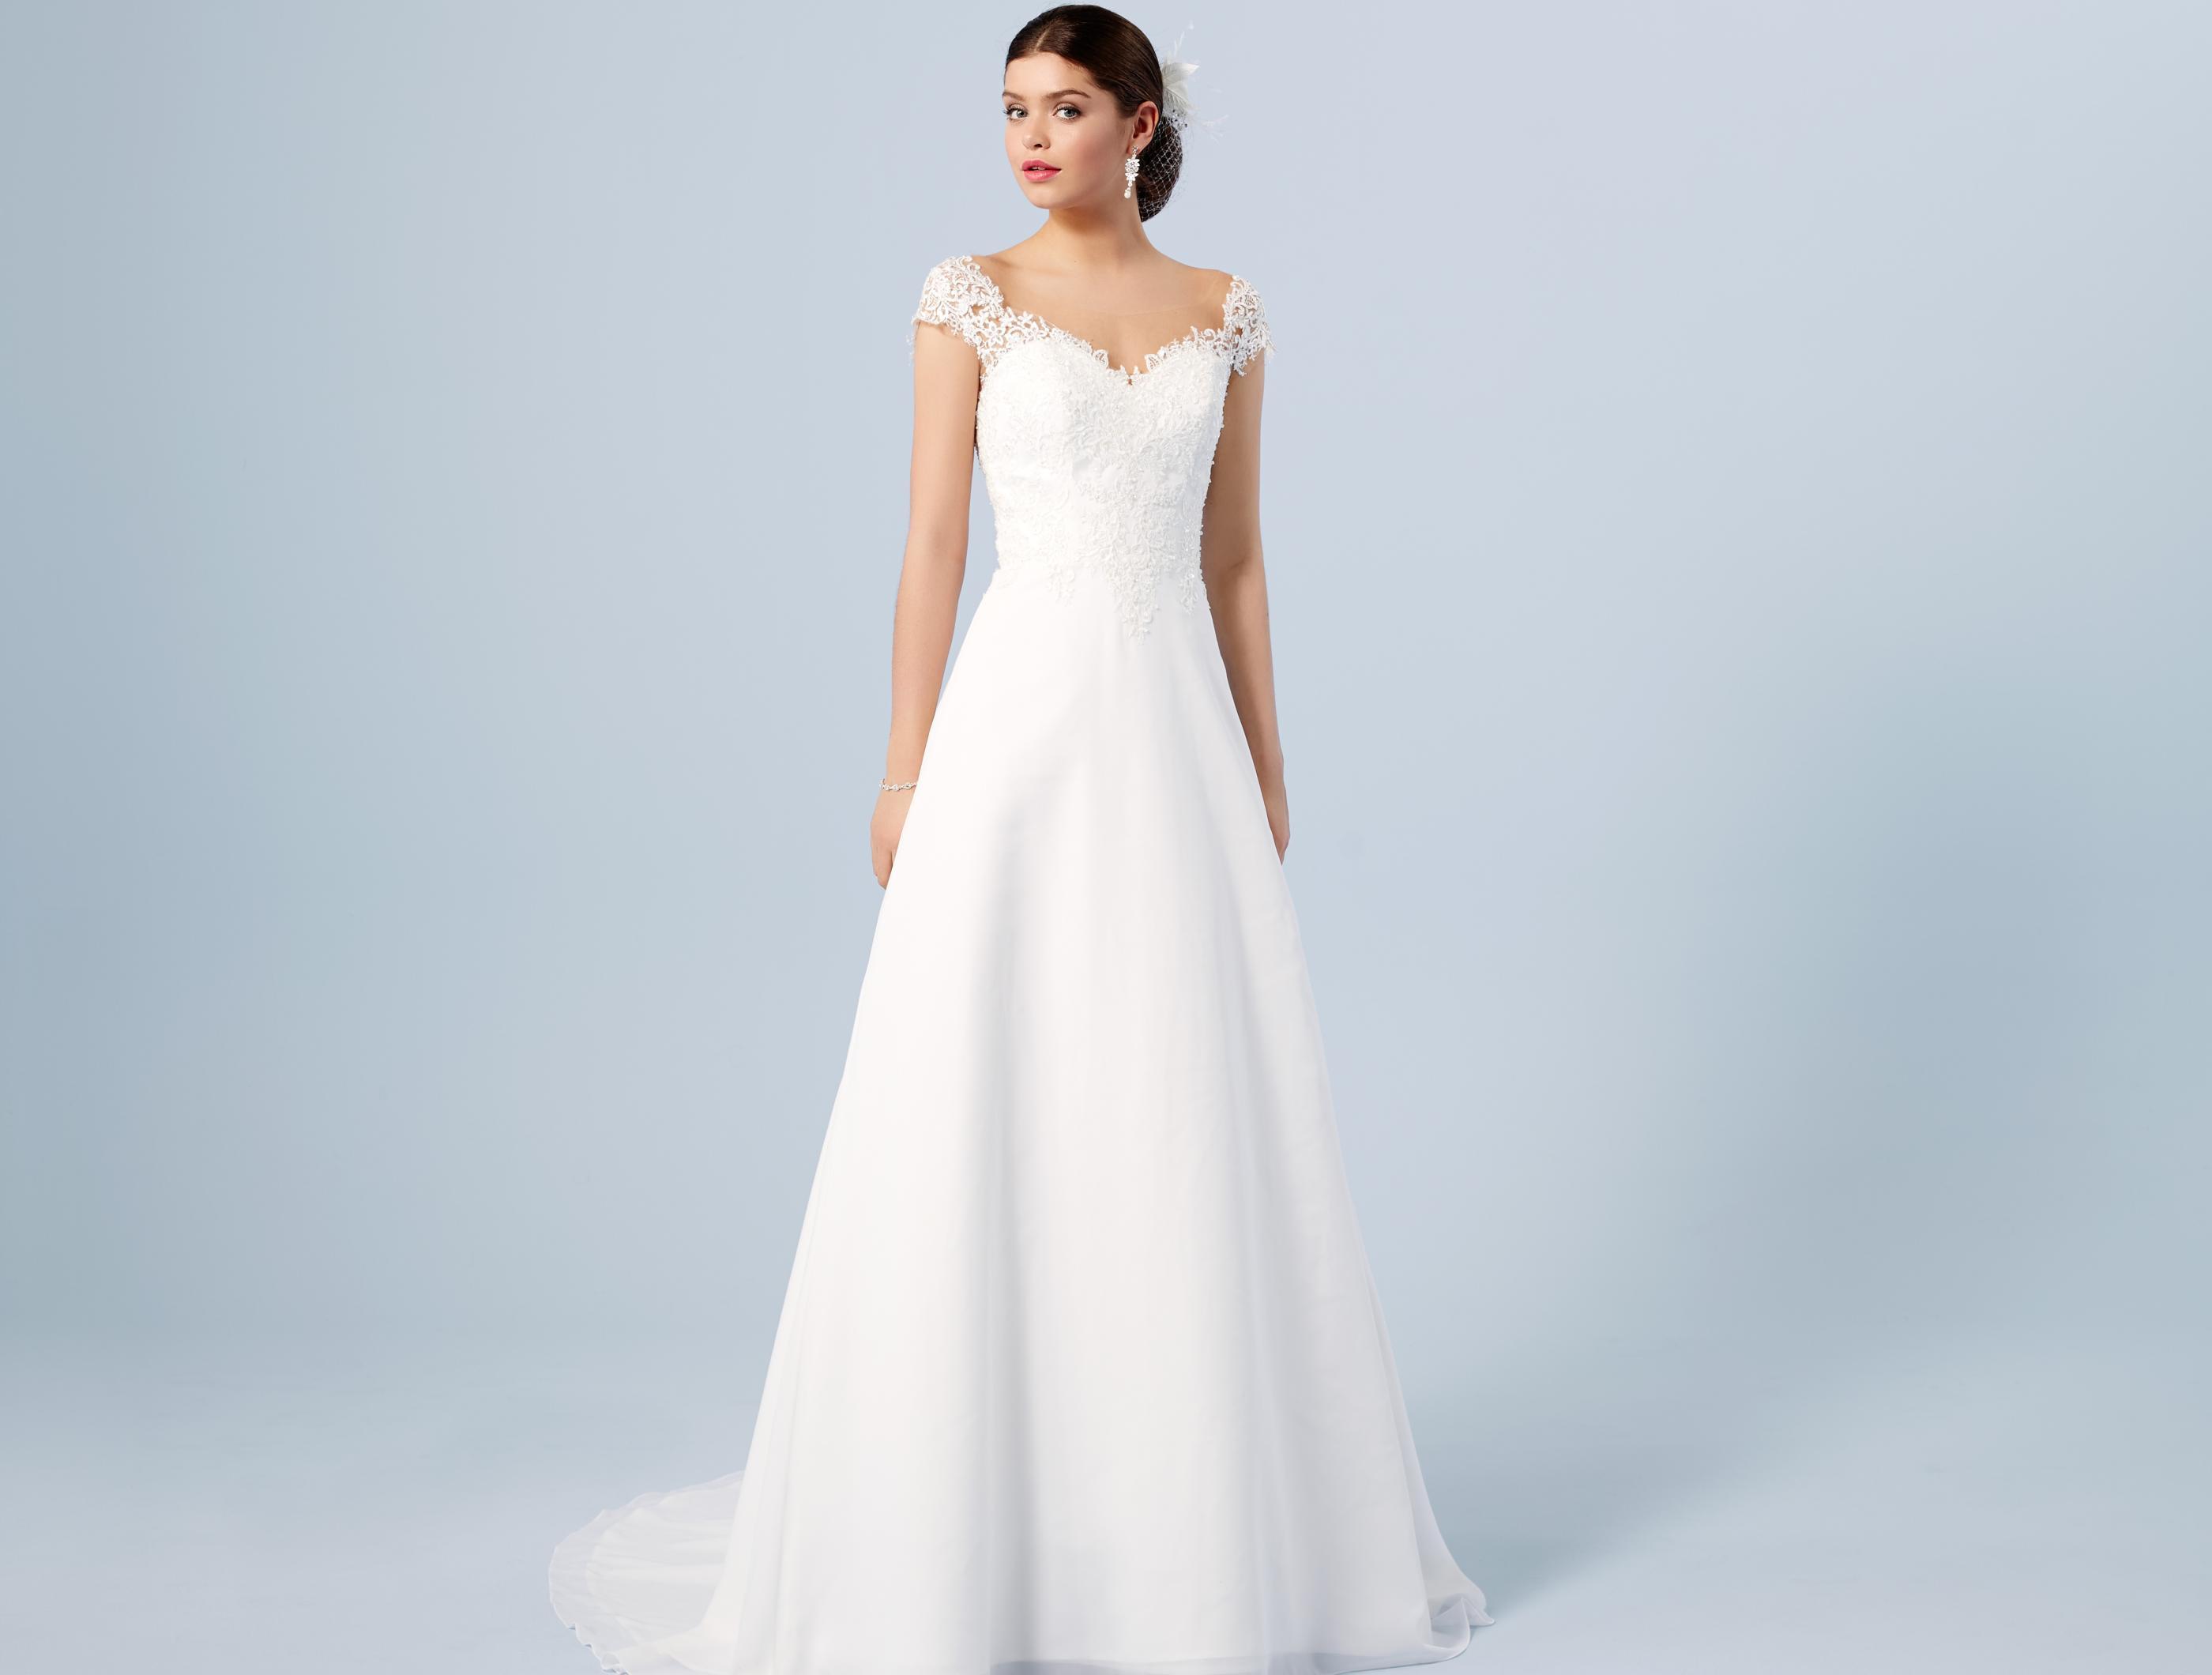 497e8a36e7c5 Brudklänning